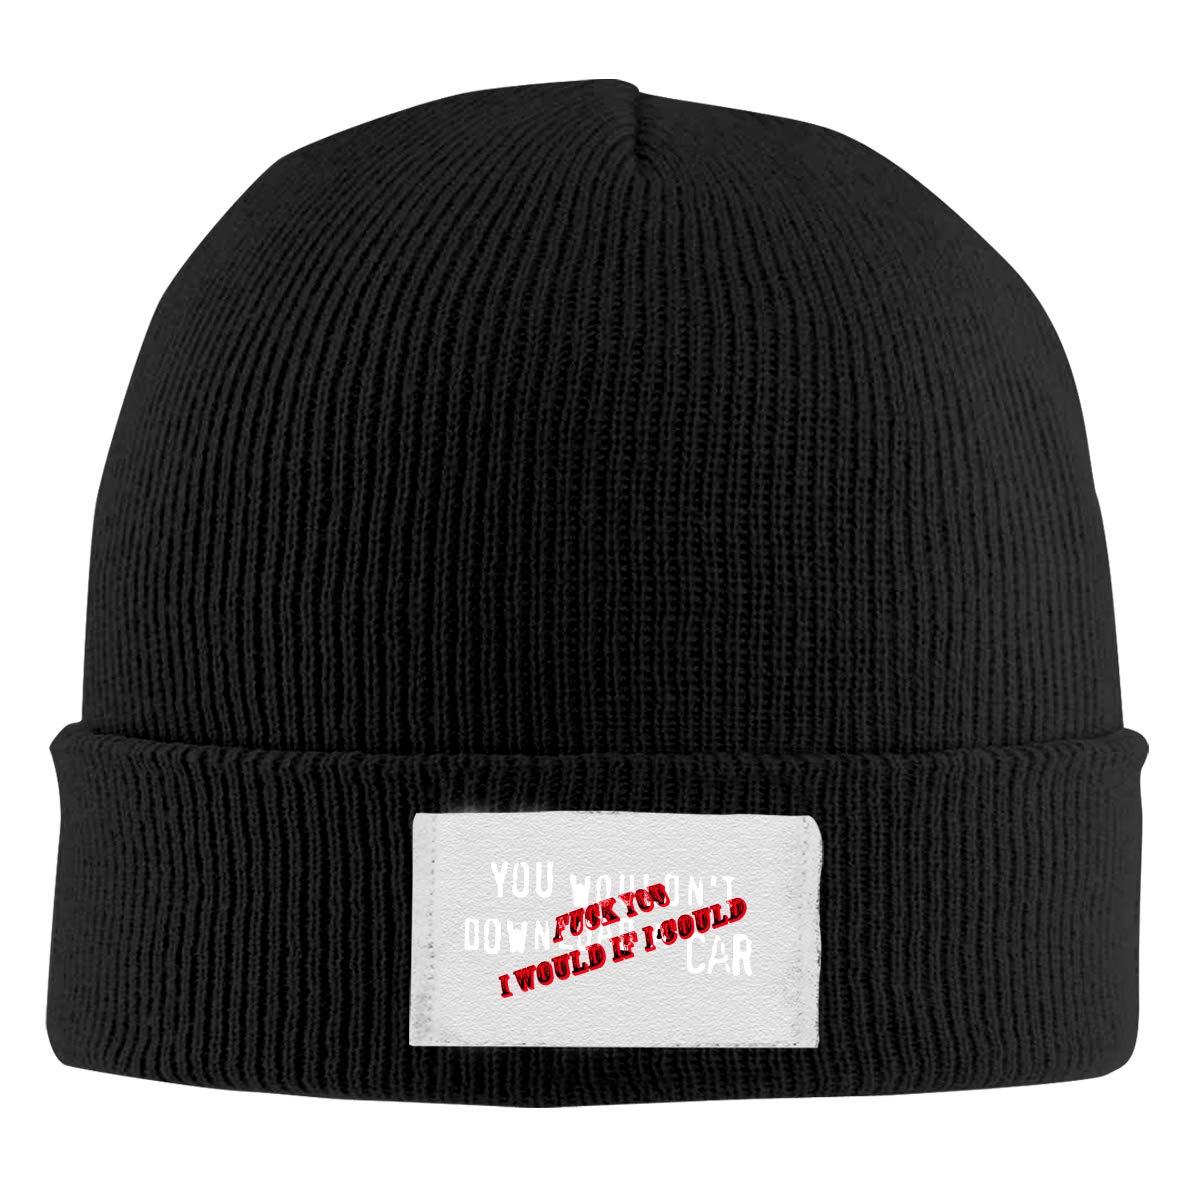 Skull Caps Golden Aries Winter Warm Knit Hats Stretchy Cuff Beanie Hat Black